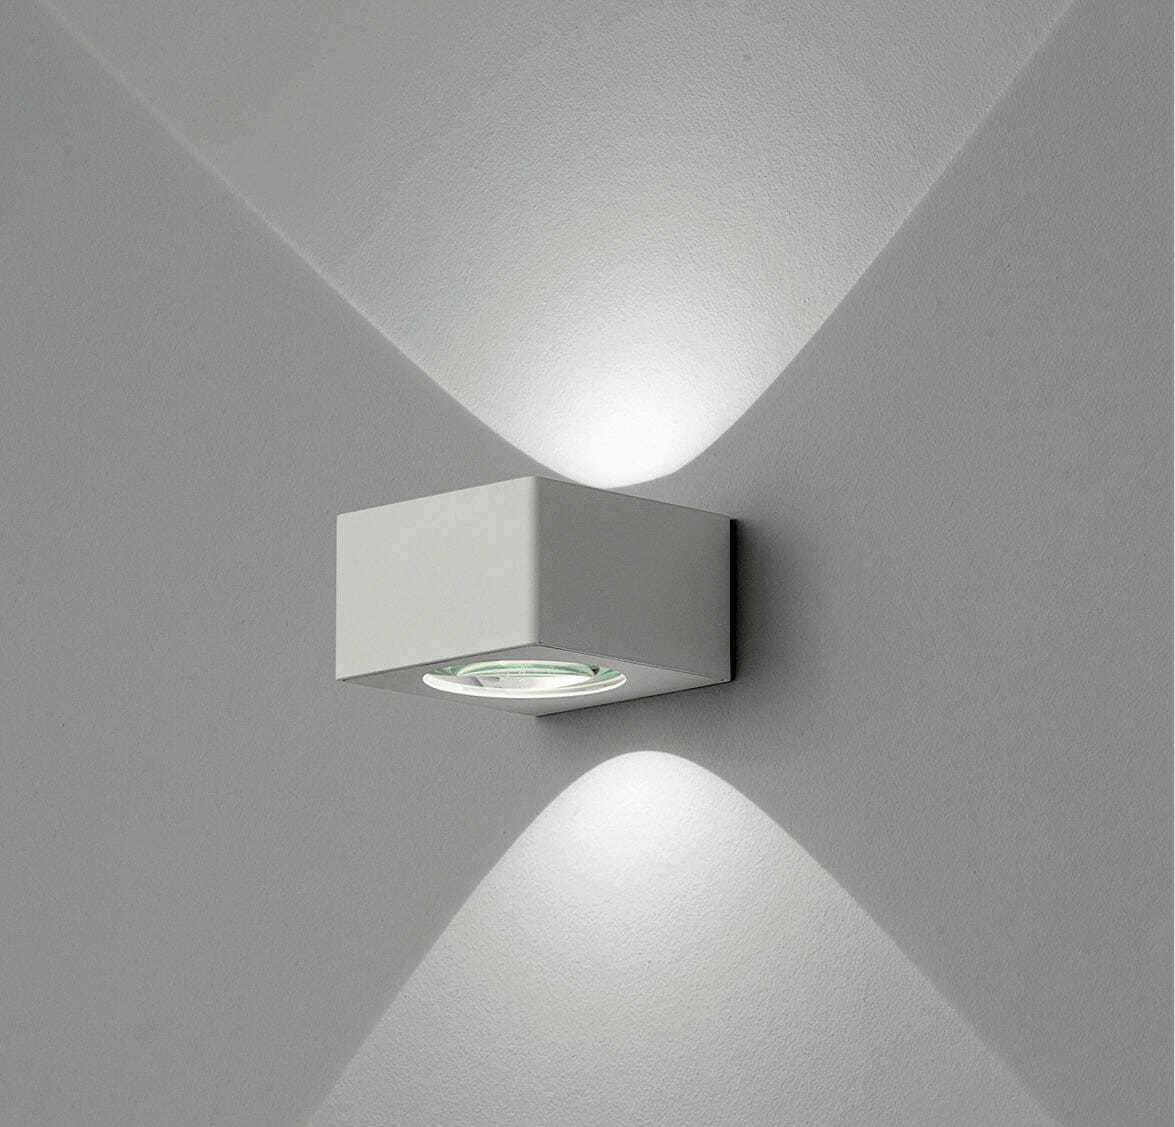 Lampada led parete biemissione lynn - Lampade design parete ...